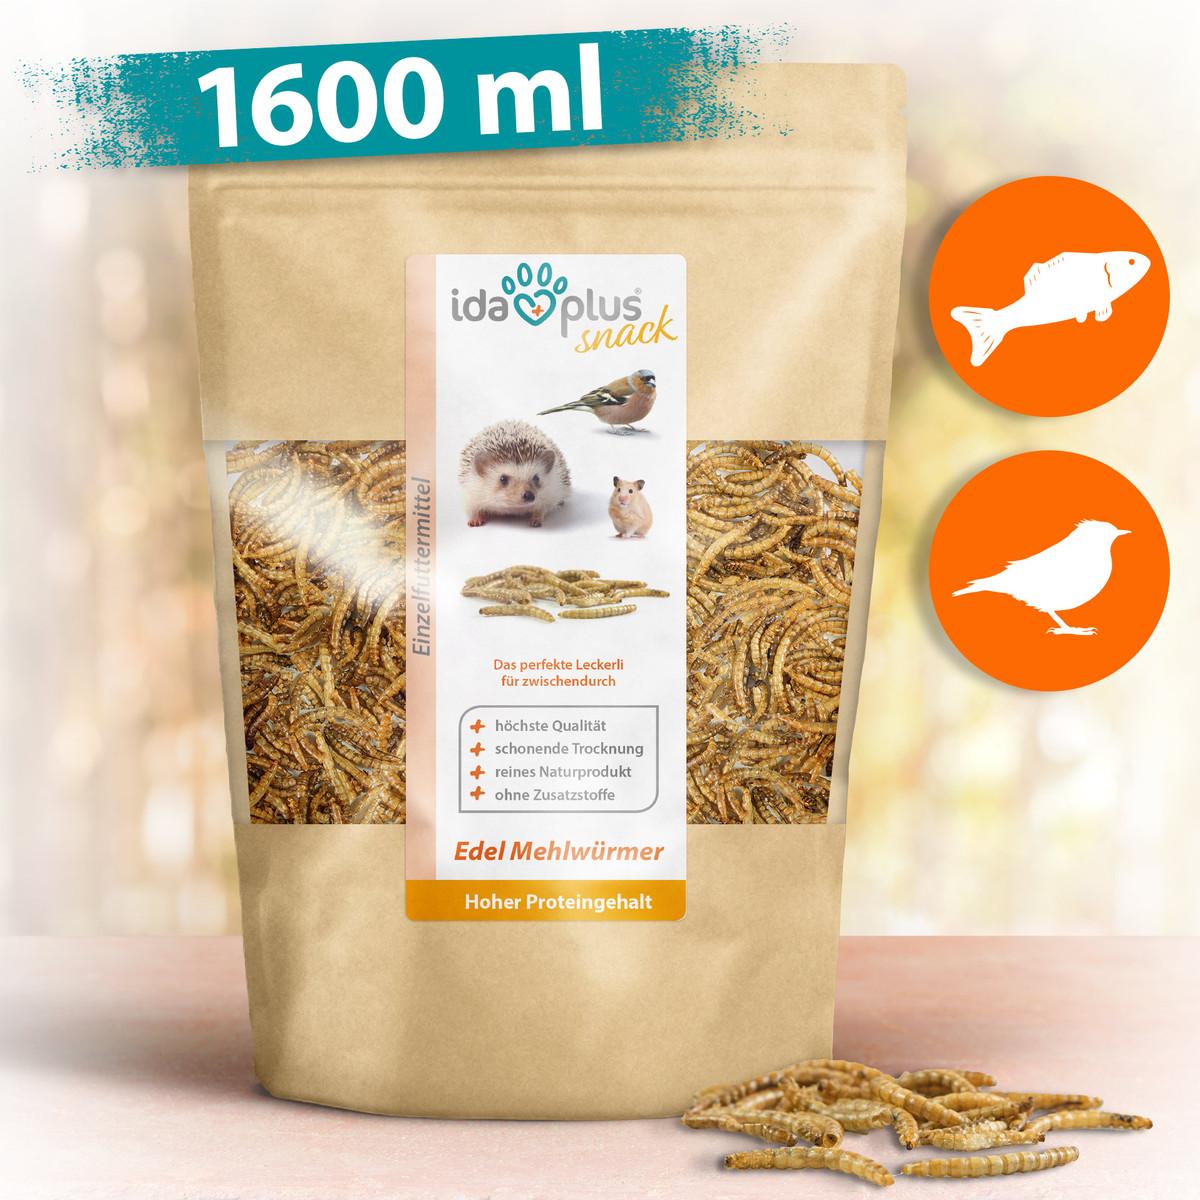 Mehlwürmer getrocknet - Insekten Snack für Igel, Hamster und Reptilien - 250 g